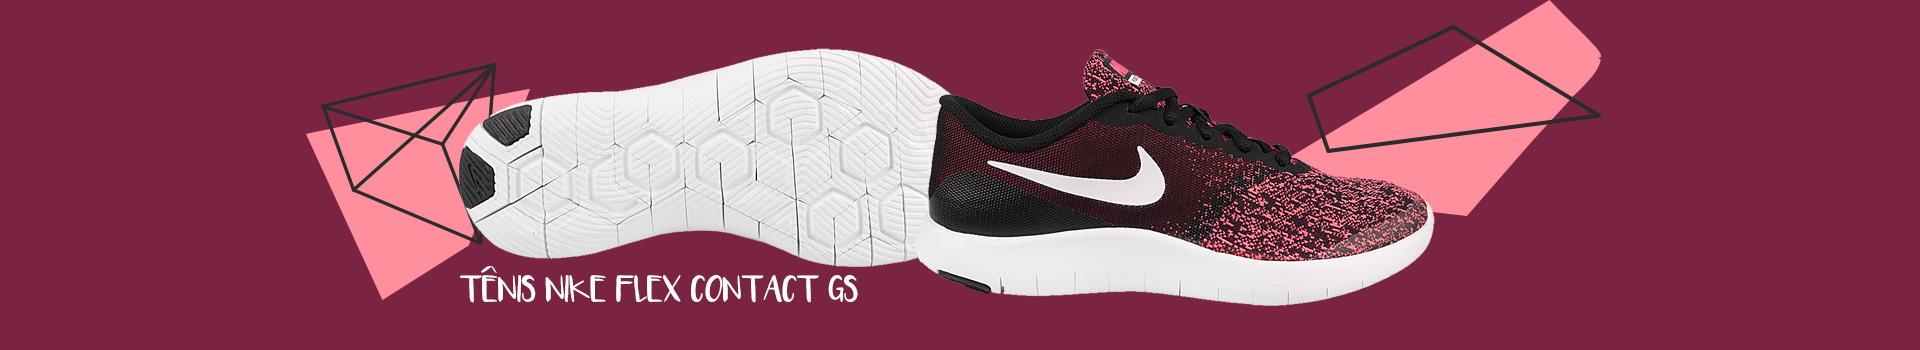 TV5-Nike_Flex_Contact